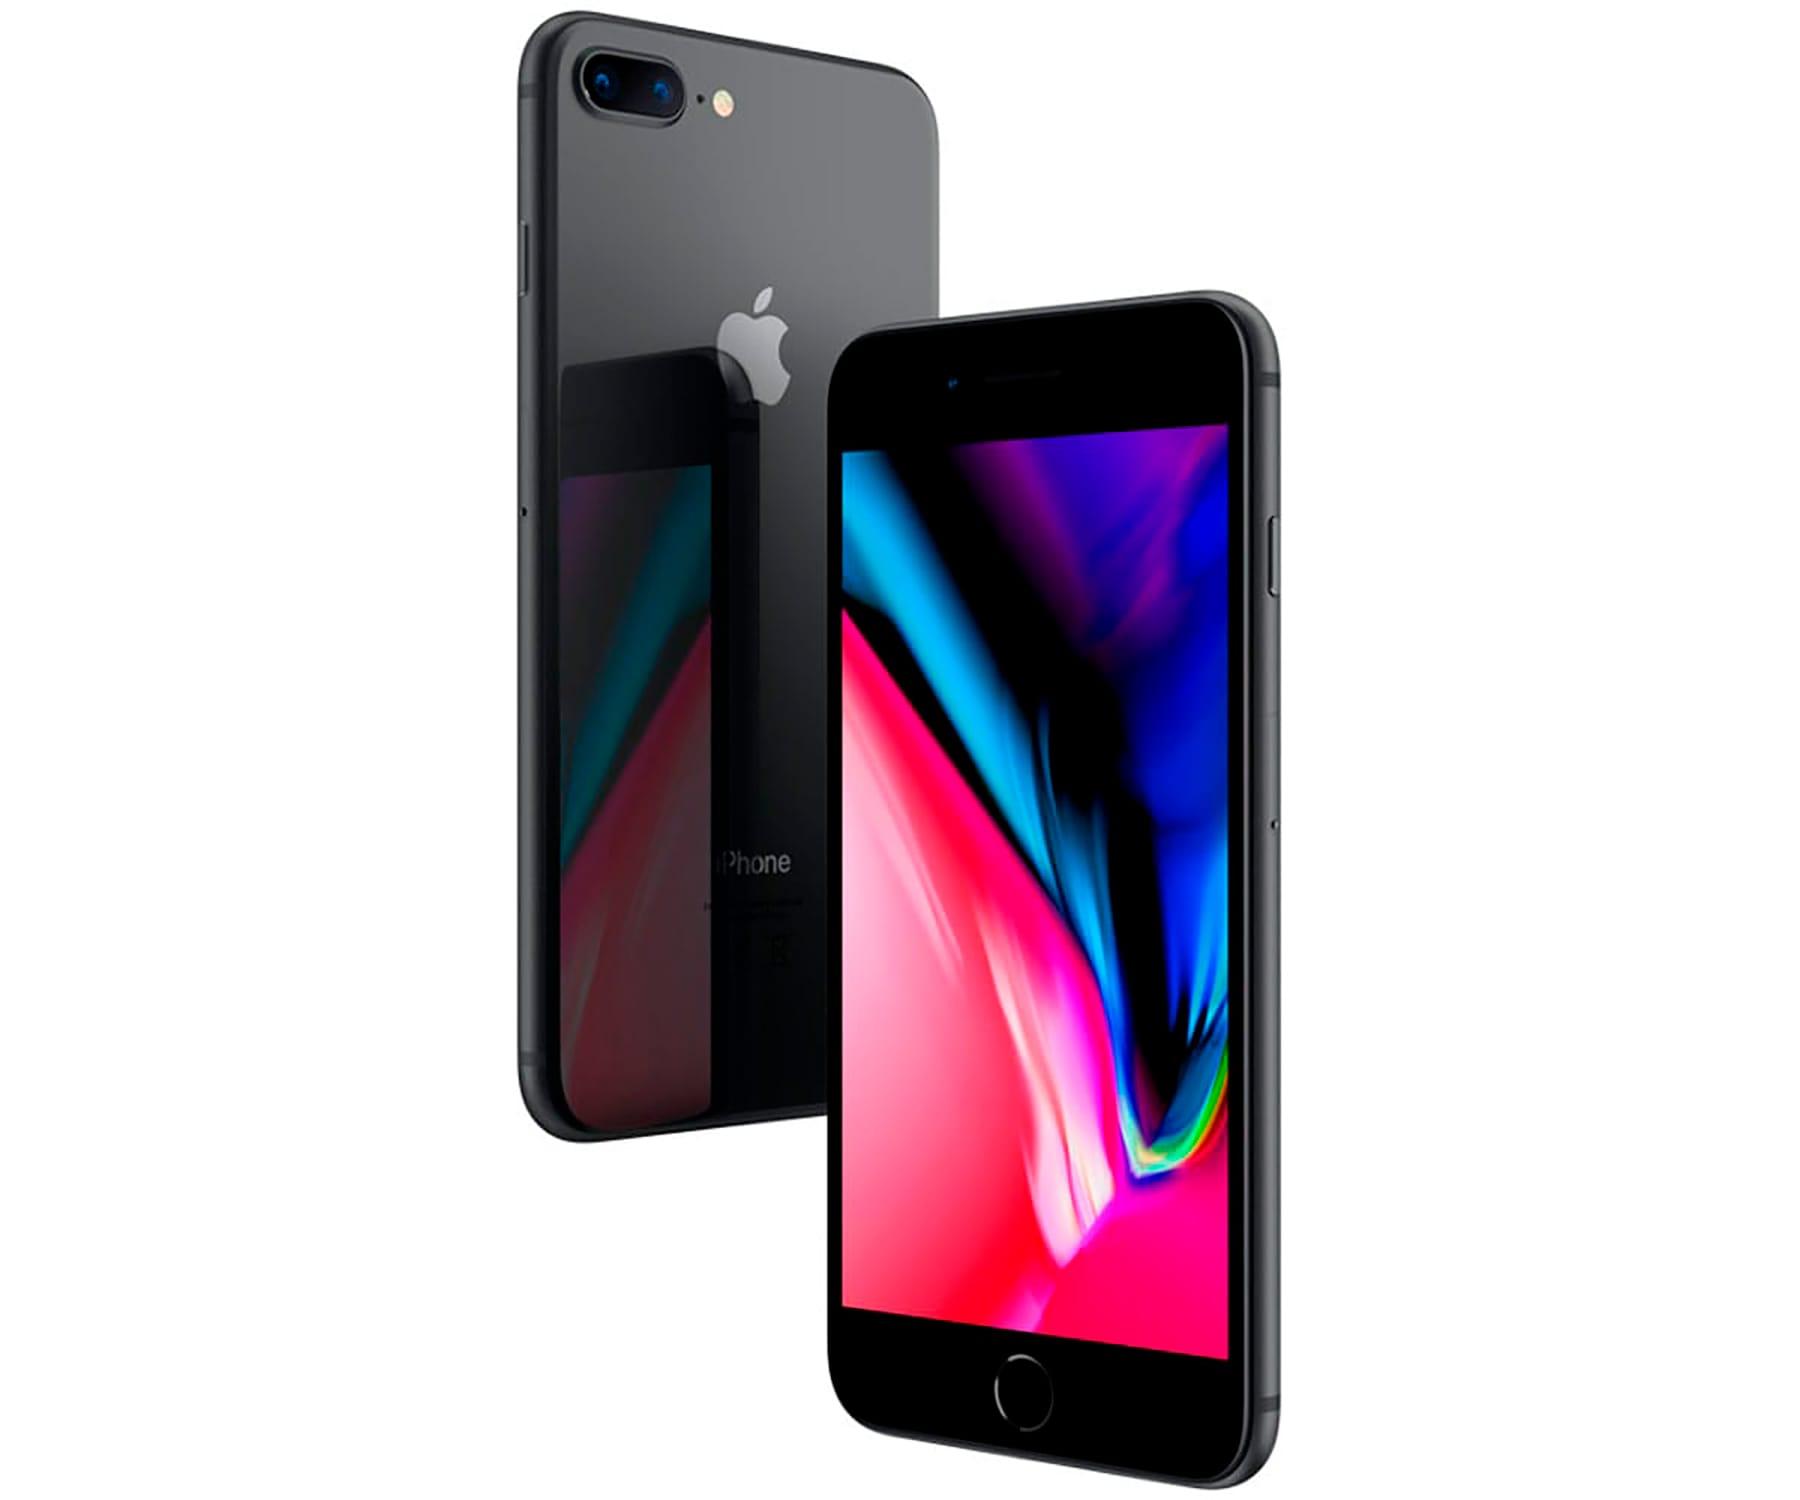 APPLE IPHONE 8 PLUS 64GB GRIS ESPACIAL REACONDICIONADO CPO MÓVIL 4G 5.5'' RETINA FHD/6CORE/64GB/3GB RAM/12MP+12MP/7MP